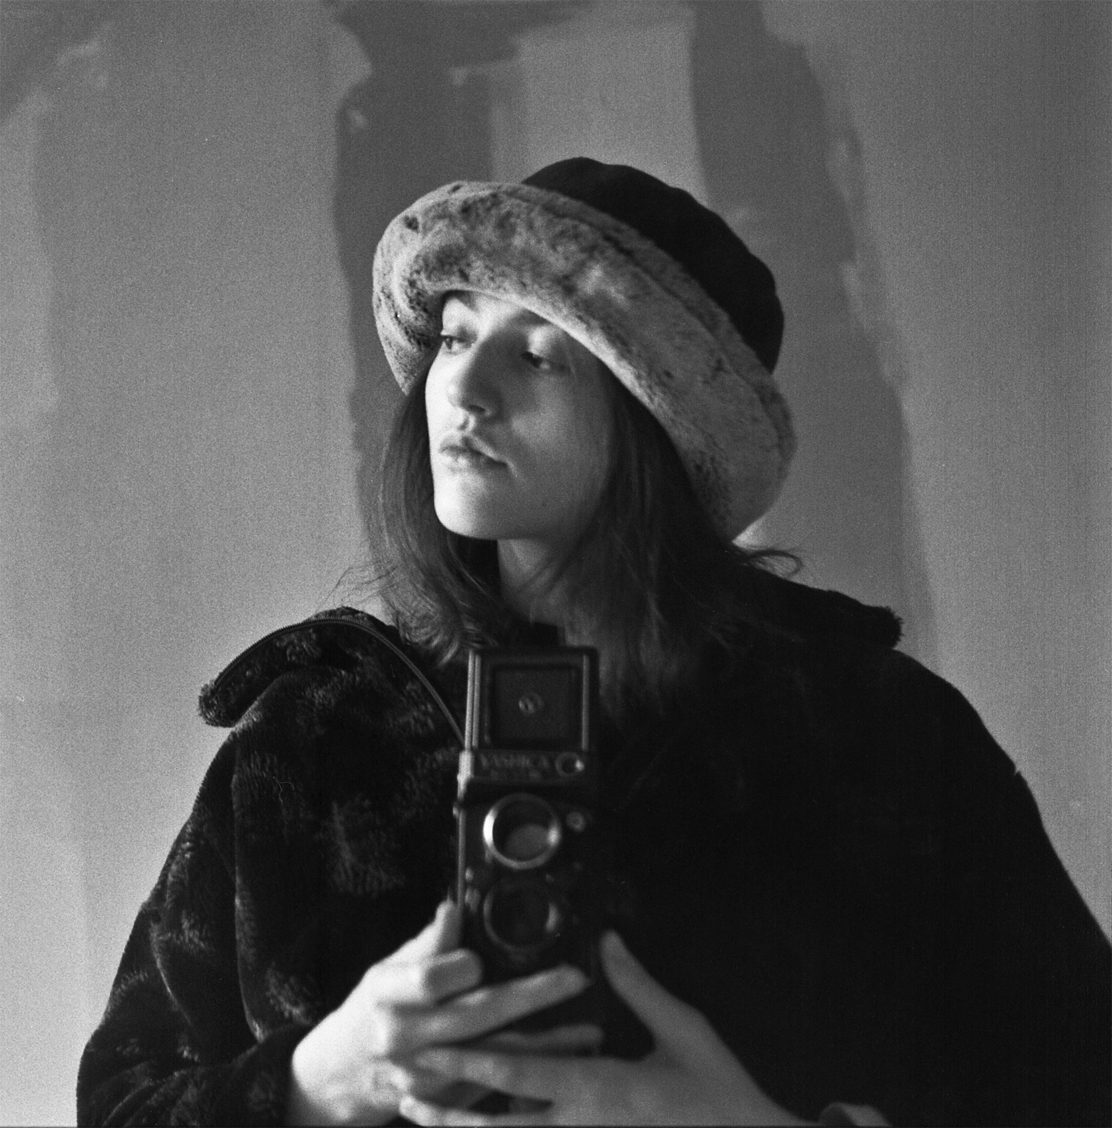 @lucindaklewis · Jun 9 Self portraits with @ILFORDPhoto shot on Yashica and Mamiya #meonfilm #fridayfavourites #ilfordphoto #fp4 #hp5